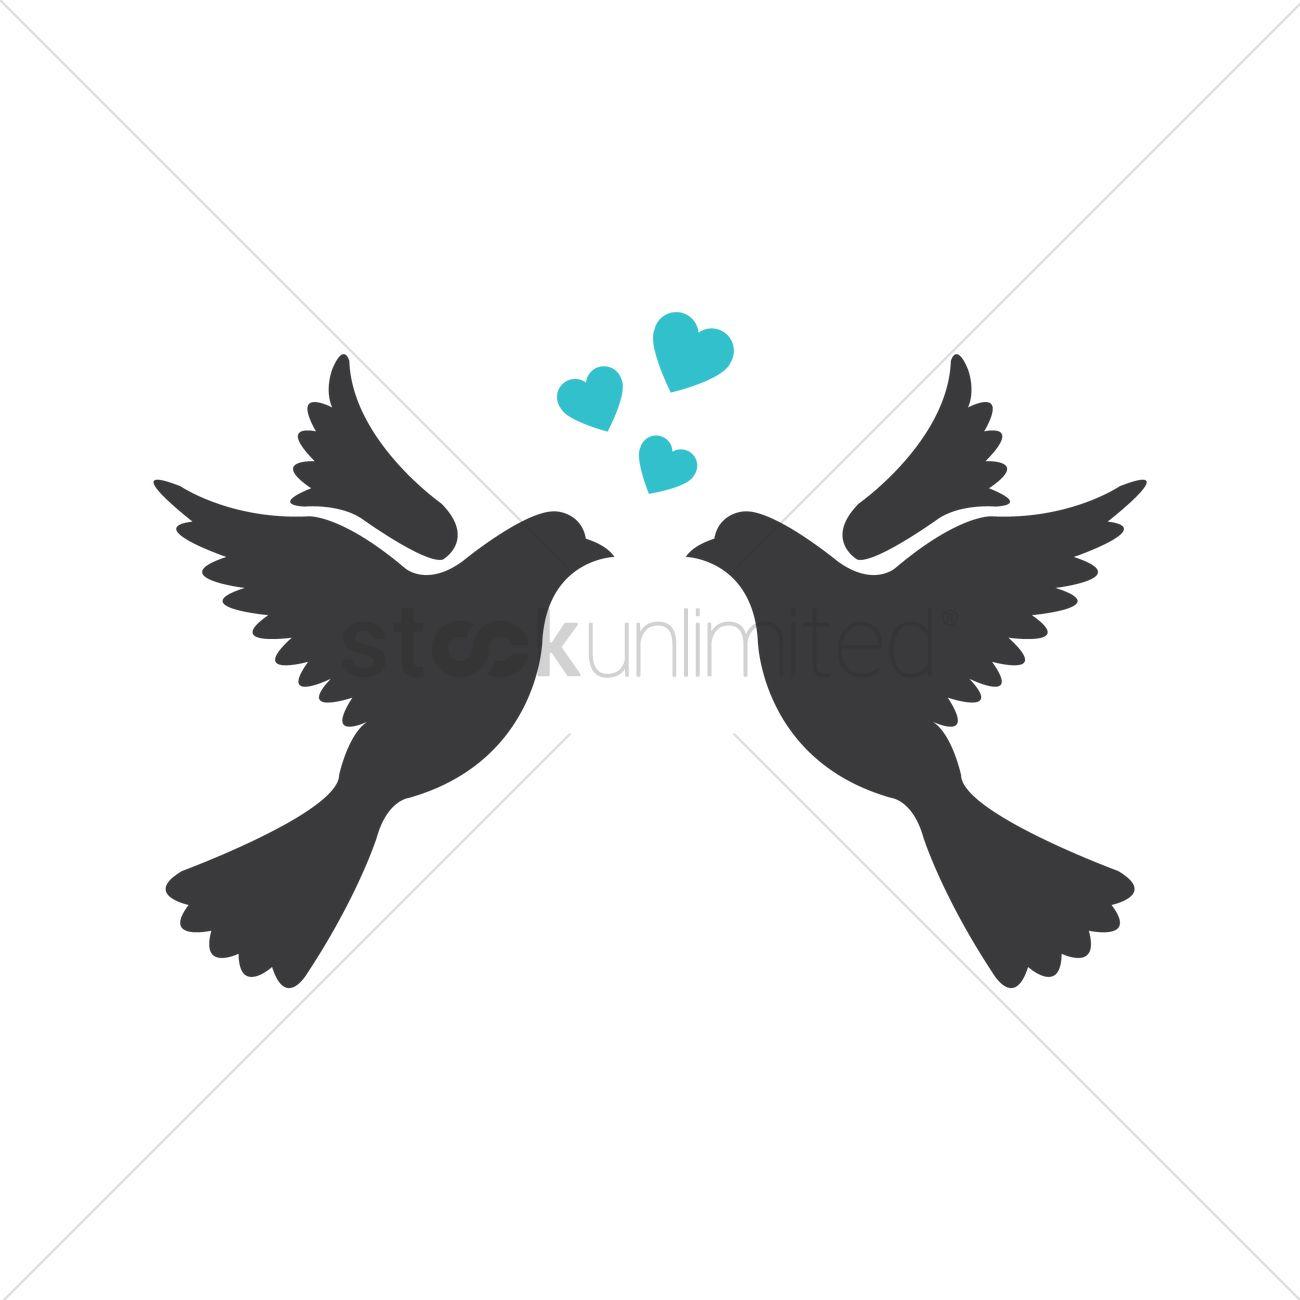 bird silhouette vector at getdrawings com free for personal use rh getdrawings com bird vector art bird vectors illustrator free